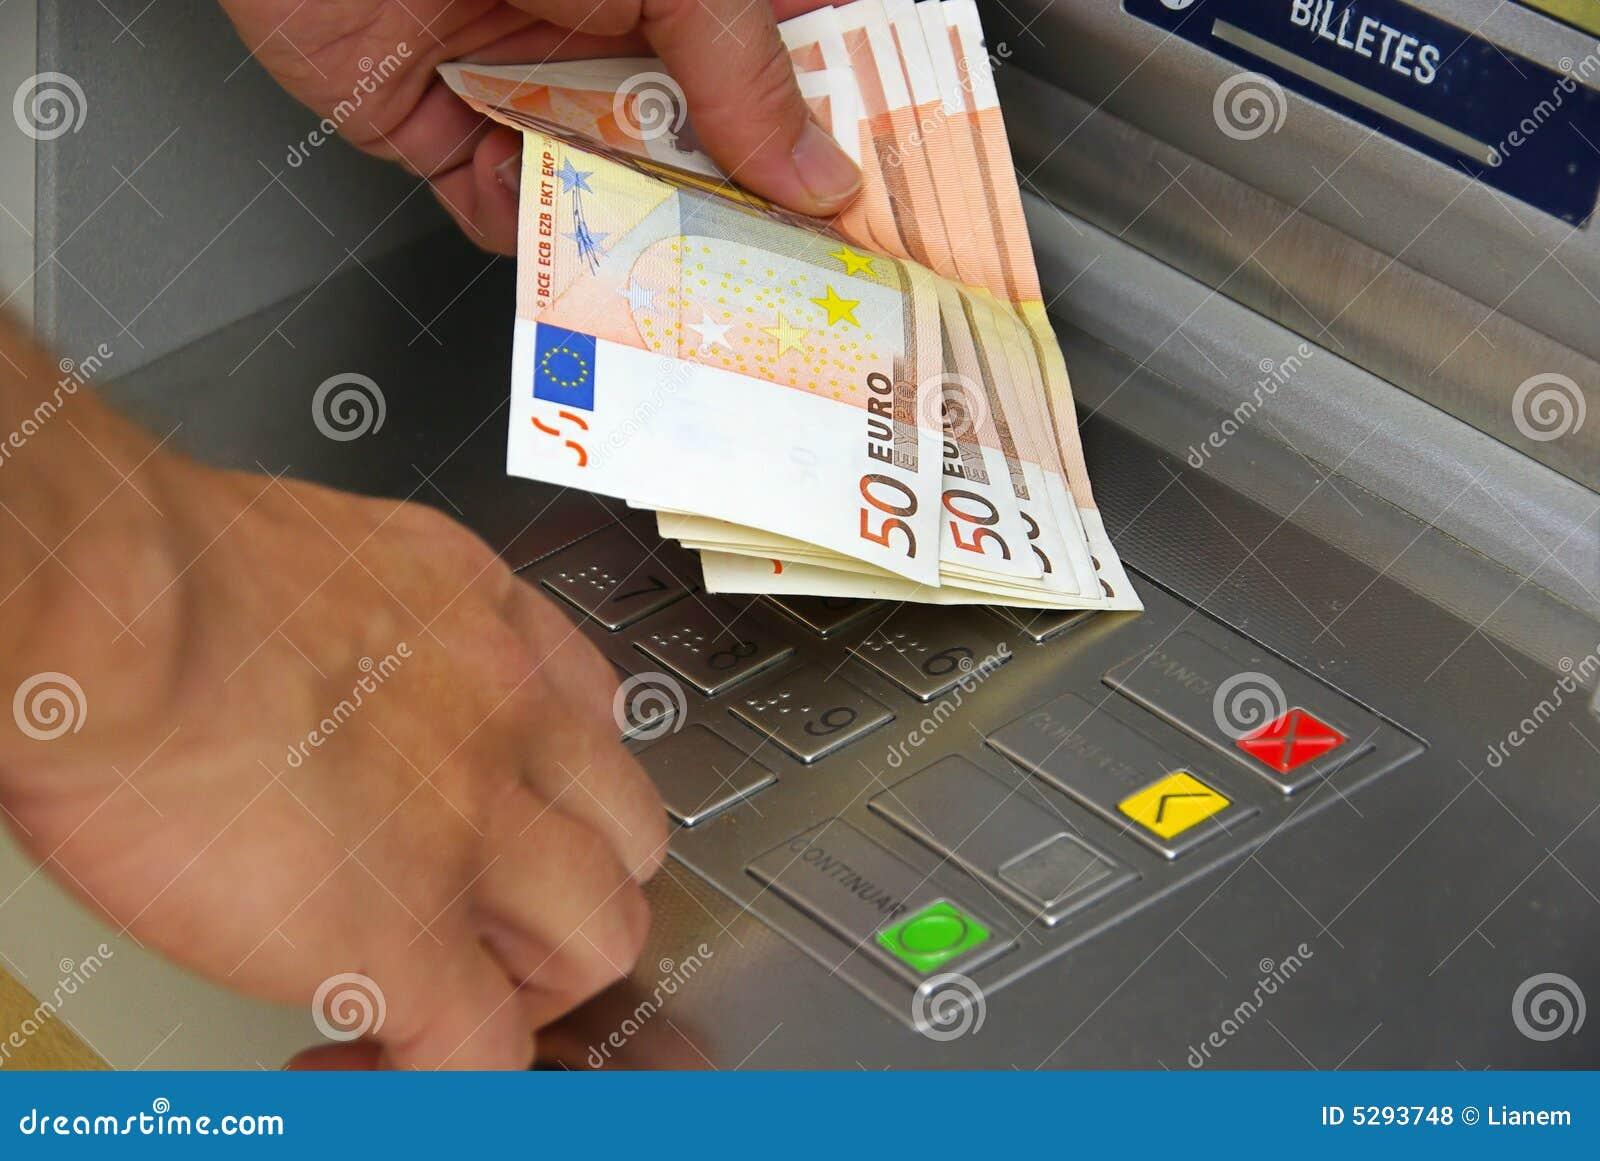 Cash point 05